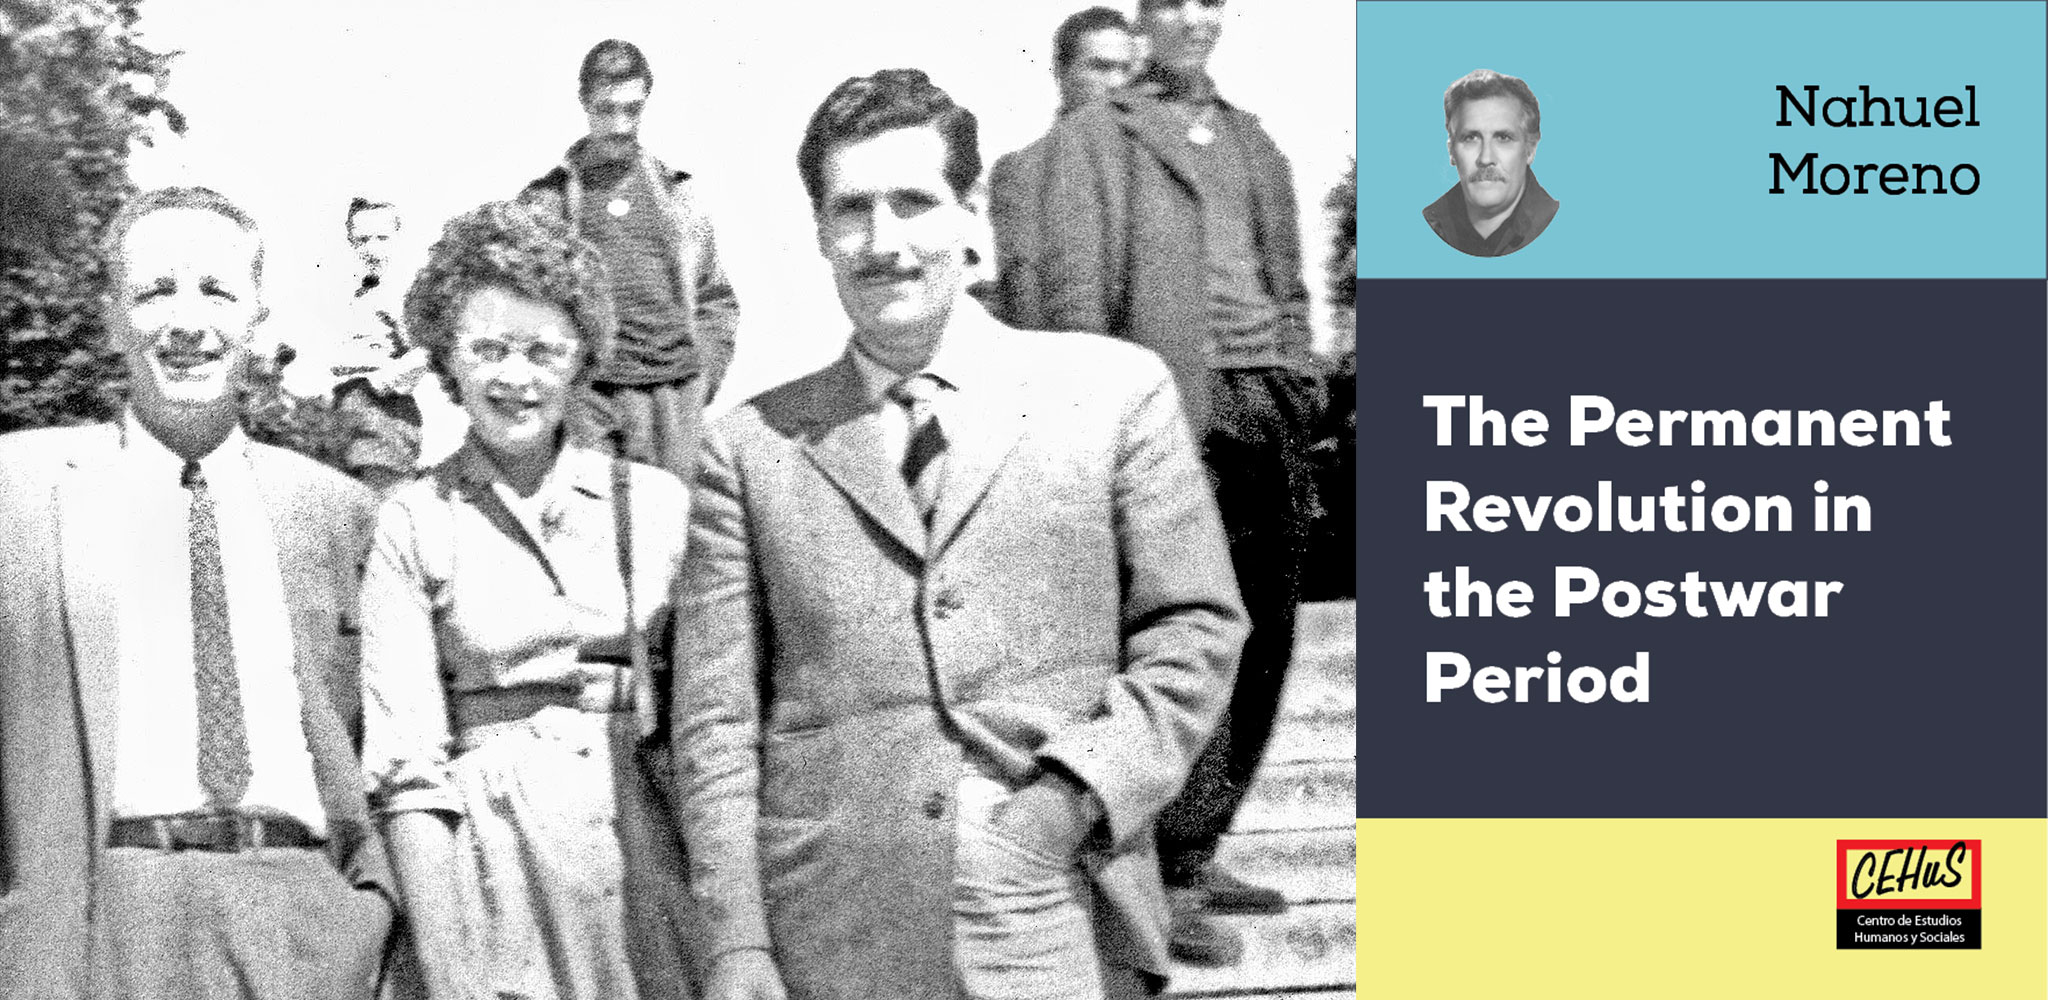 THE PERMANENT REVOLUTION IN THE POSTWAR PERIOD (1958)